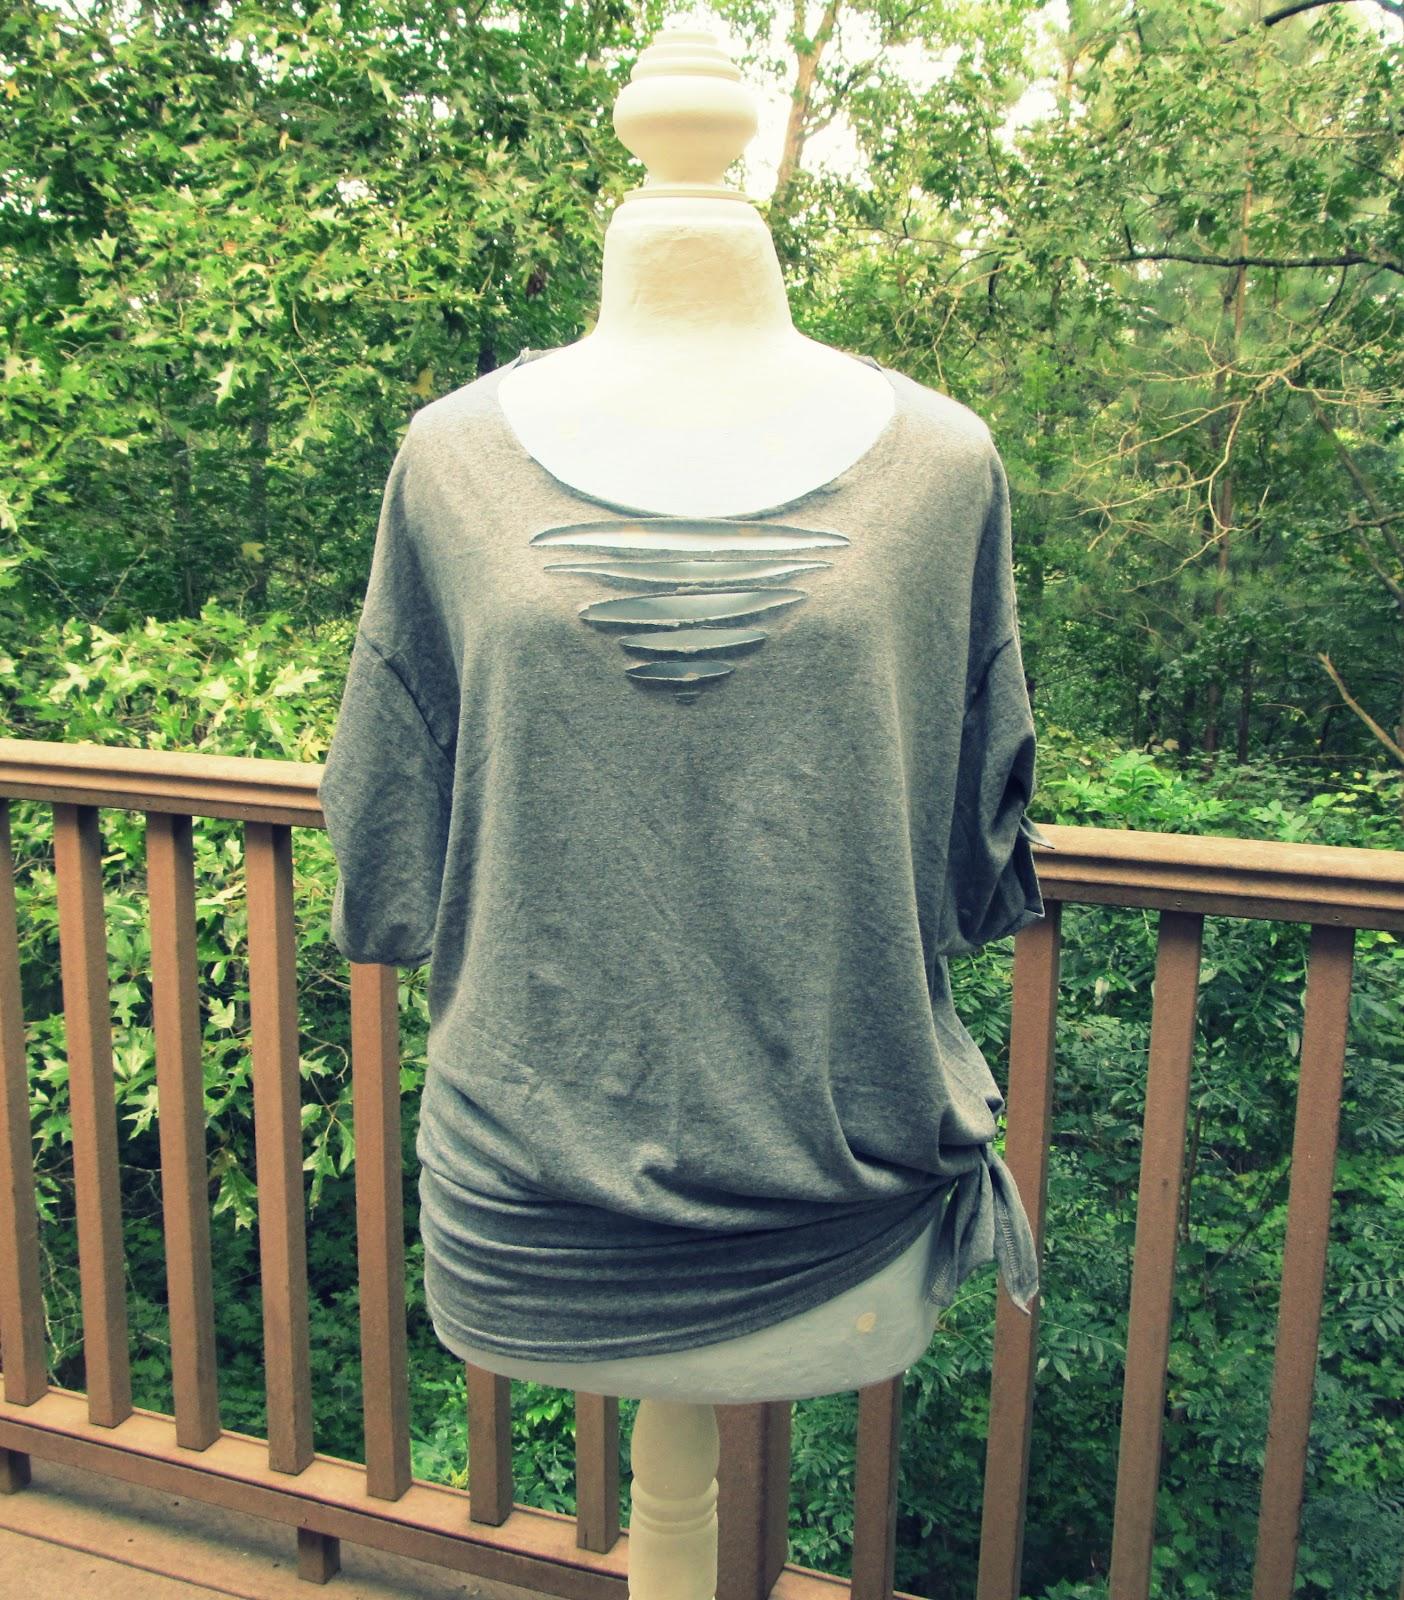 wobisobi no sew triangle tee shirt diy. Black Bedroom Furniture Sets. Home Design Ideas